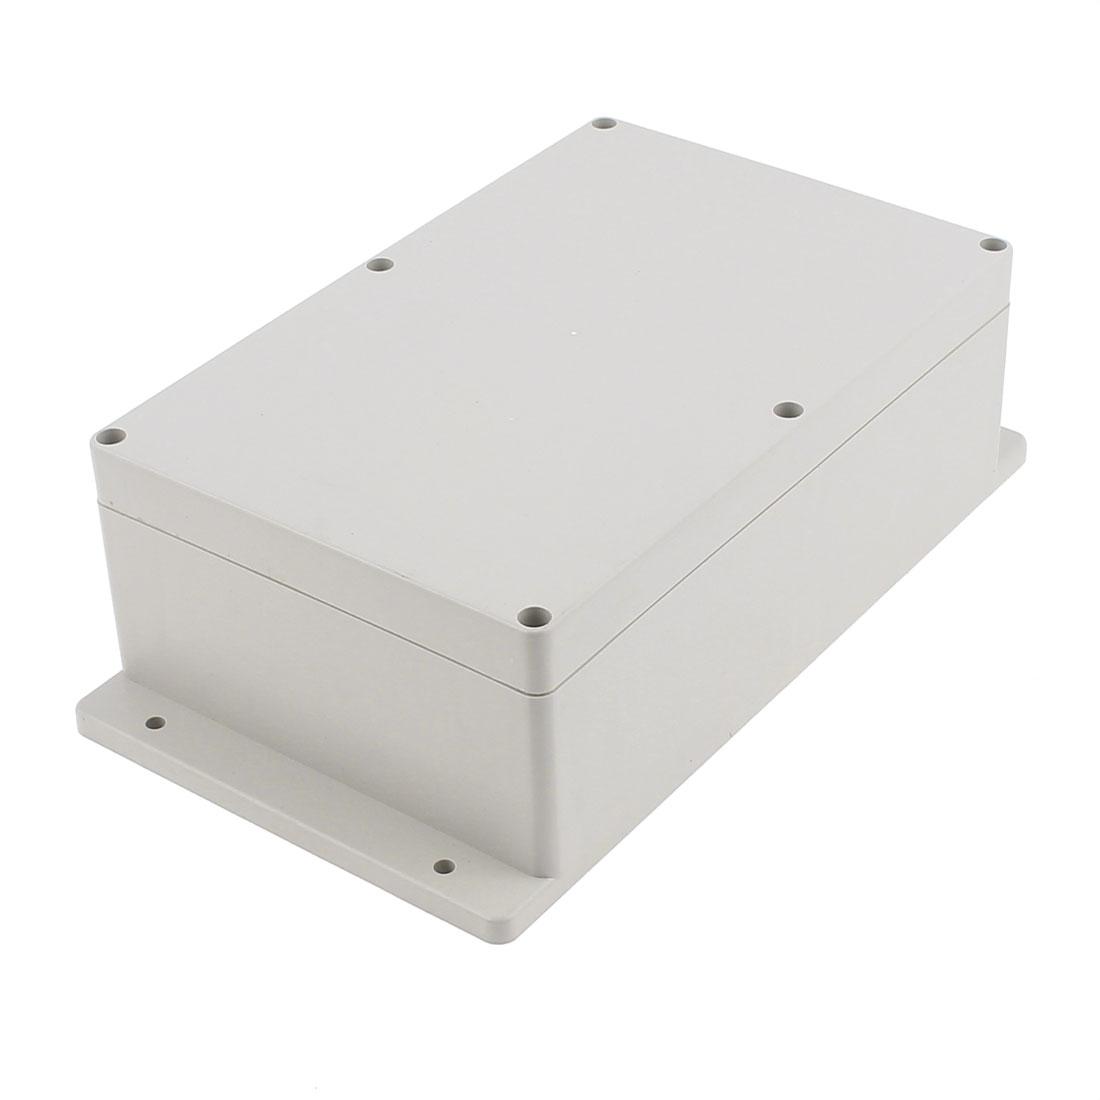 230 x 150 x 85mm Dustproof IP65 Junction Box DIY Terminal Connecting Enclosure